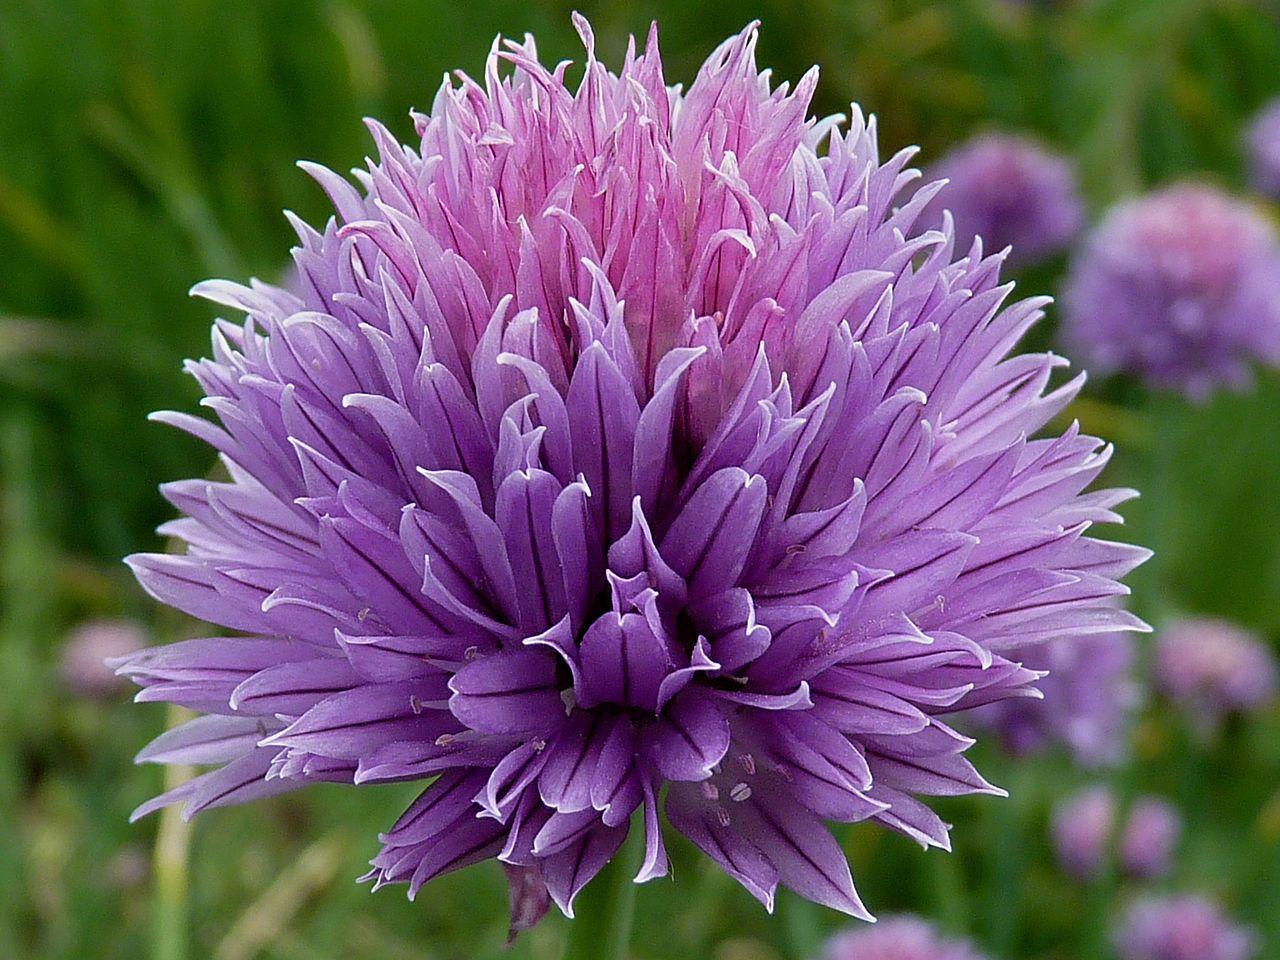 Agapanthus Beautiful Ornamental Purple Fragrant Love Flower Garden Seeds 100 PCS